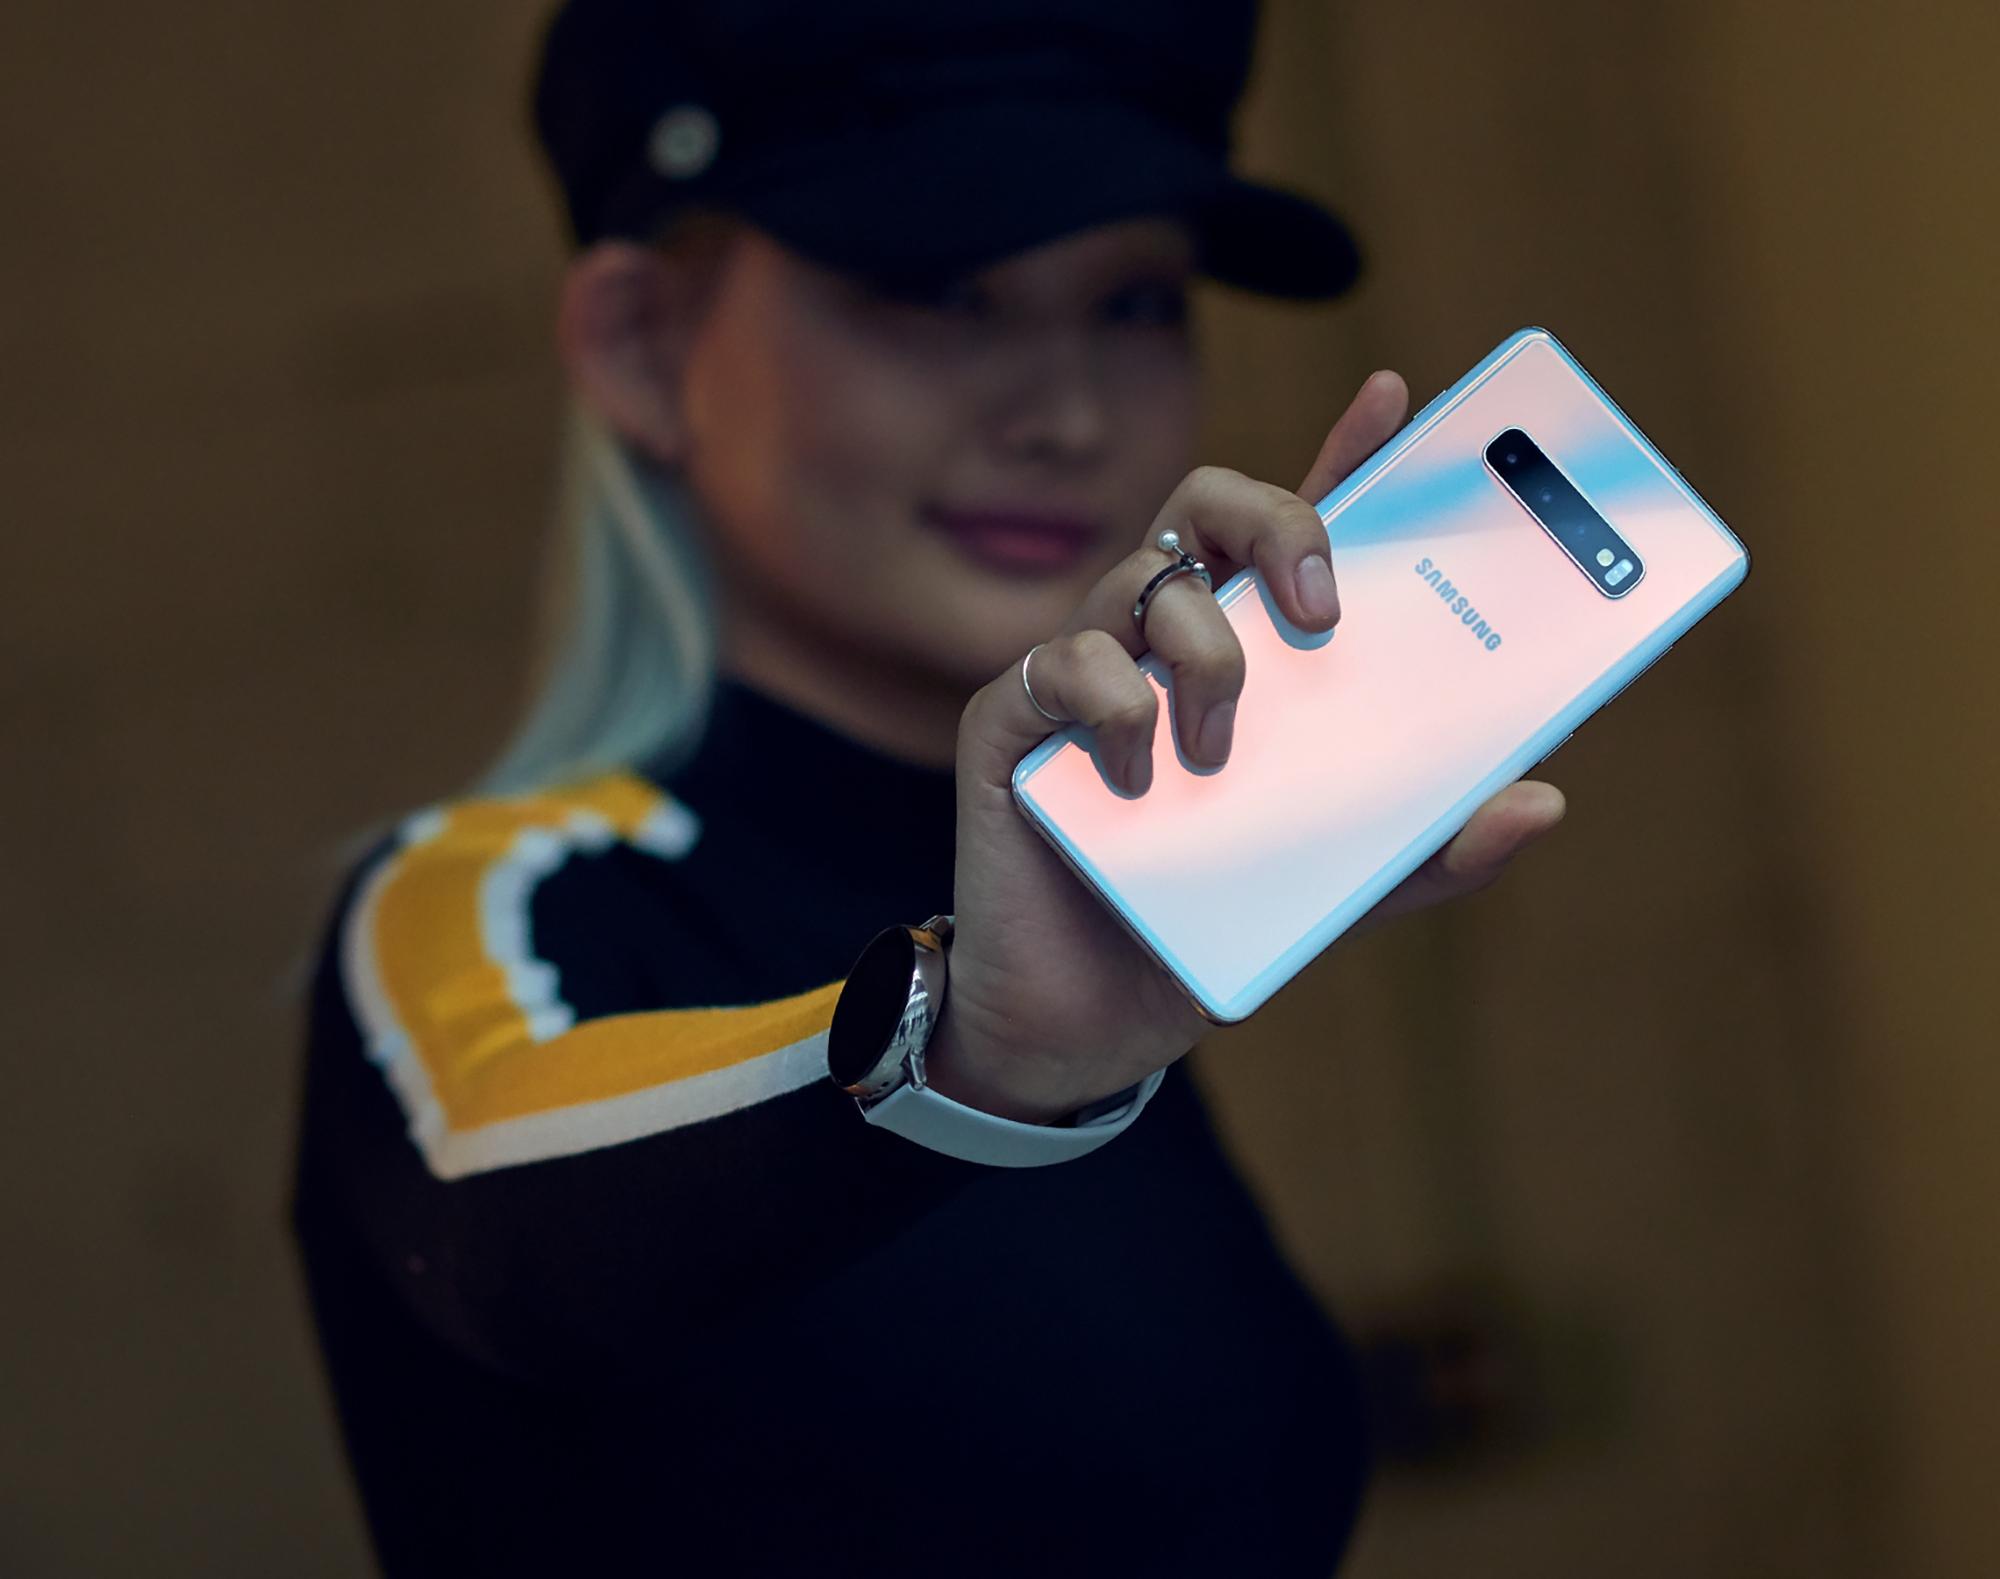 Il Trend Radar di Samsung svela i gusti dei Millennials sugli smartphone thumbnail